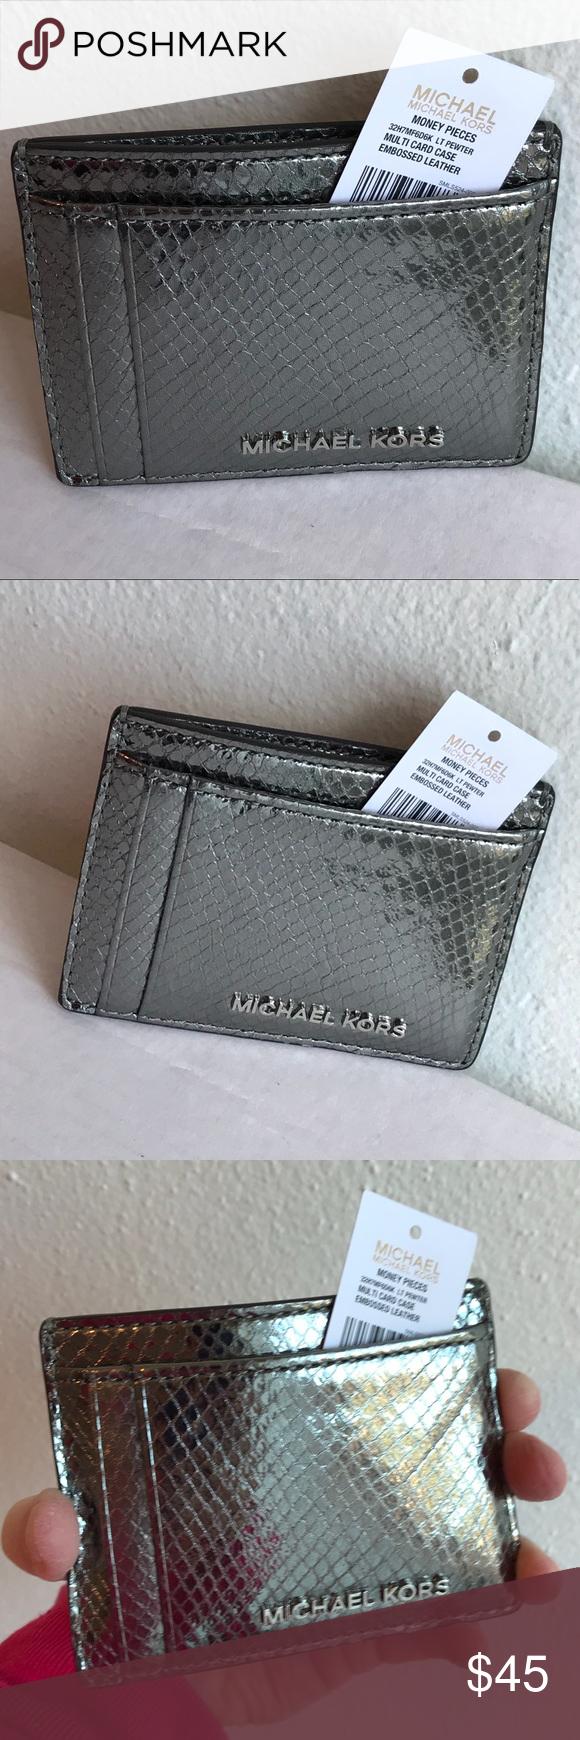 f2d70558da74b4 Michael Kors Metallic Snake Print Card Holder Beautiful pewter color leather  snake print card holder